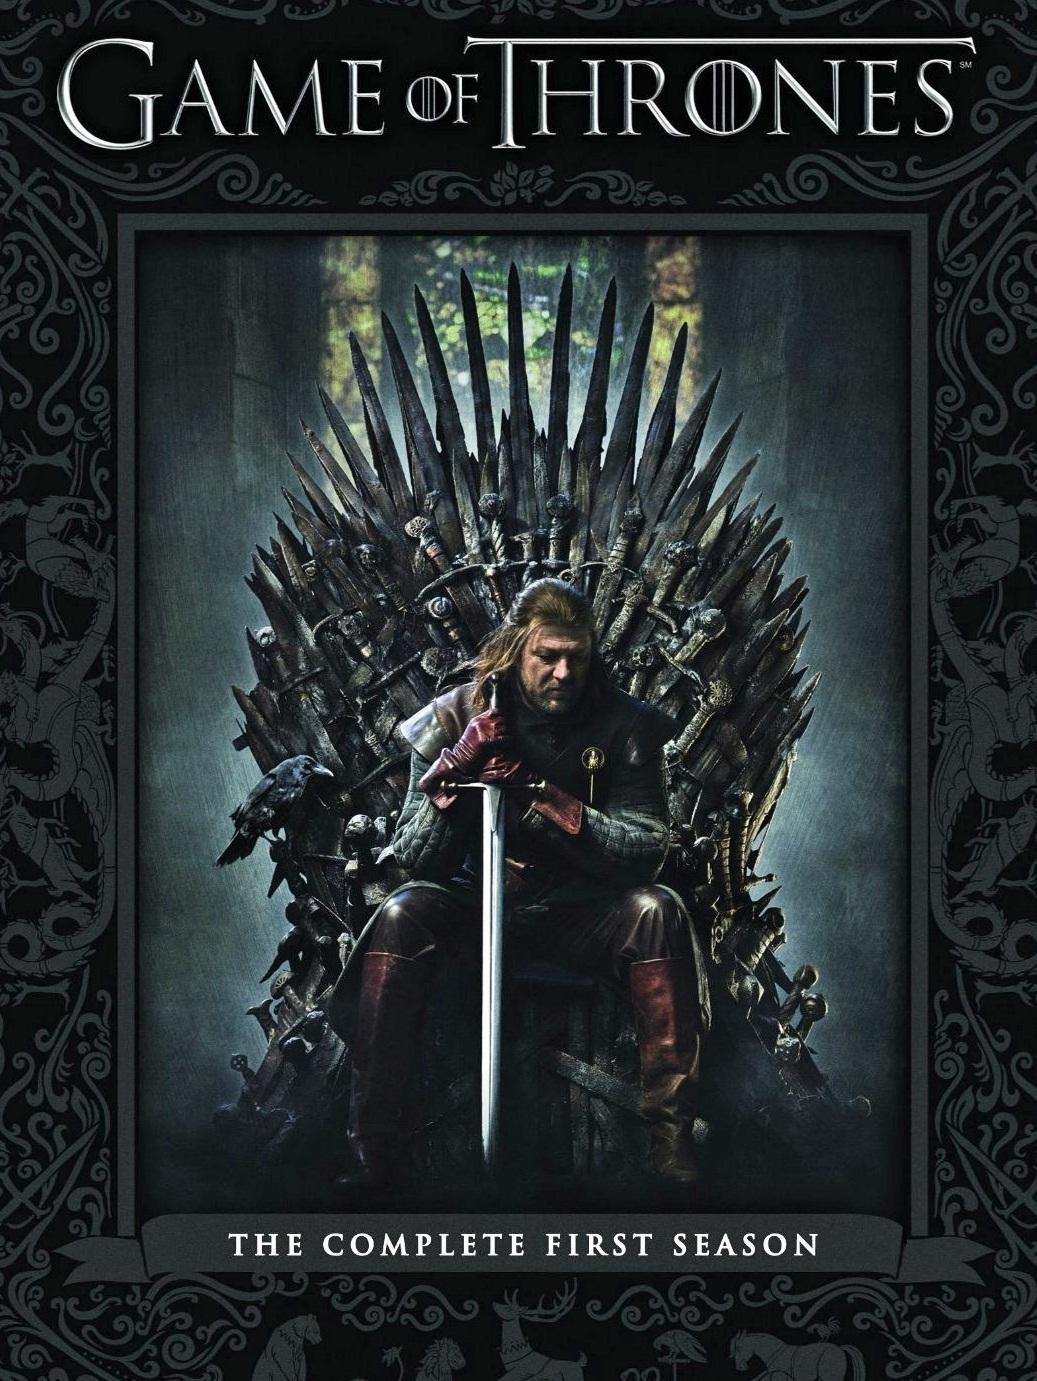 http://3.bp.blogspot.com/-OCjIc4mPKJc/T5g7Pig7uAI/AAAAAAAACJ4/4UcAEH5Hrlg/s1600/Game-of-Thrones_S1-DVD.jpg1.jpg